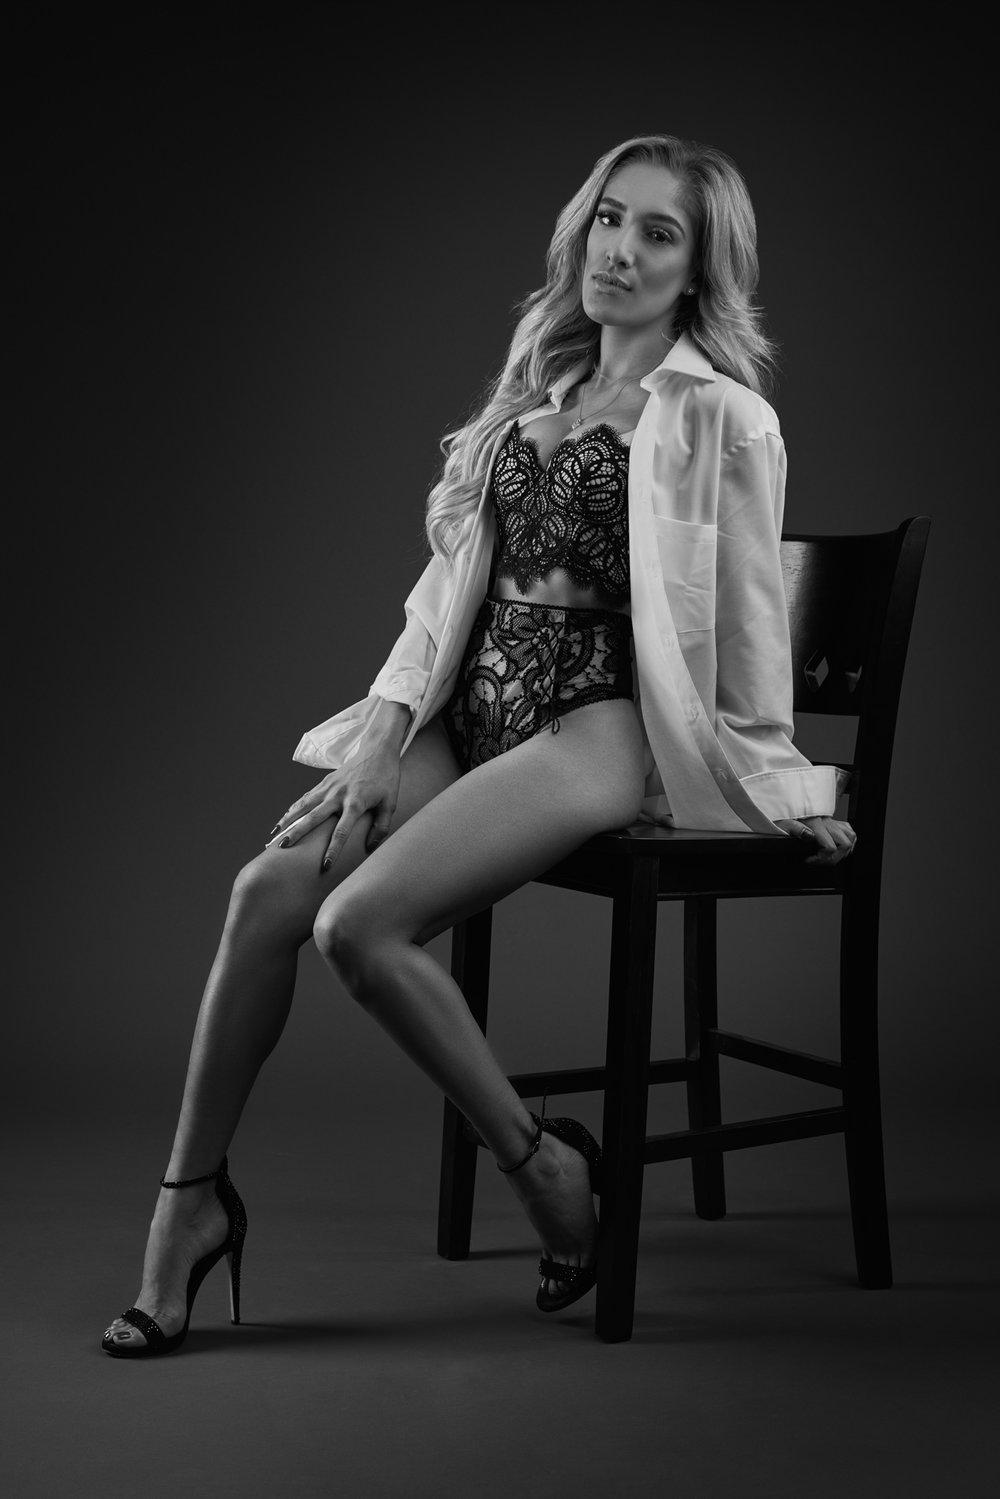 Jasmine Fashion Model by Arizona Fashion Portrait Photographer Chad Weed